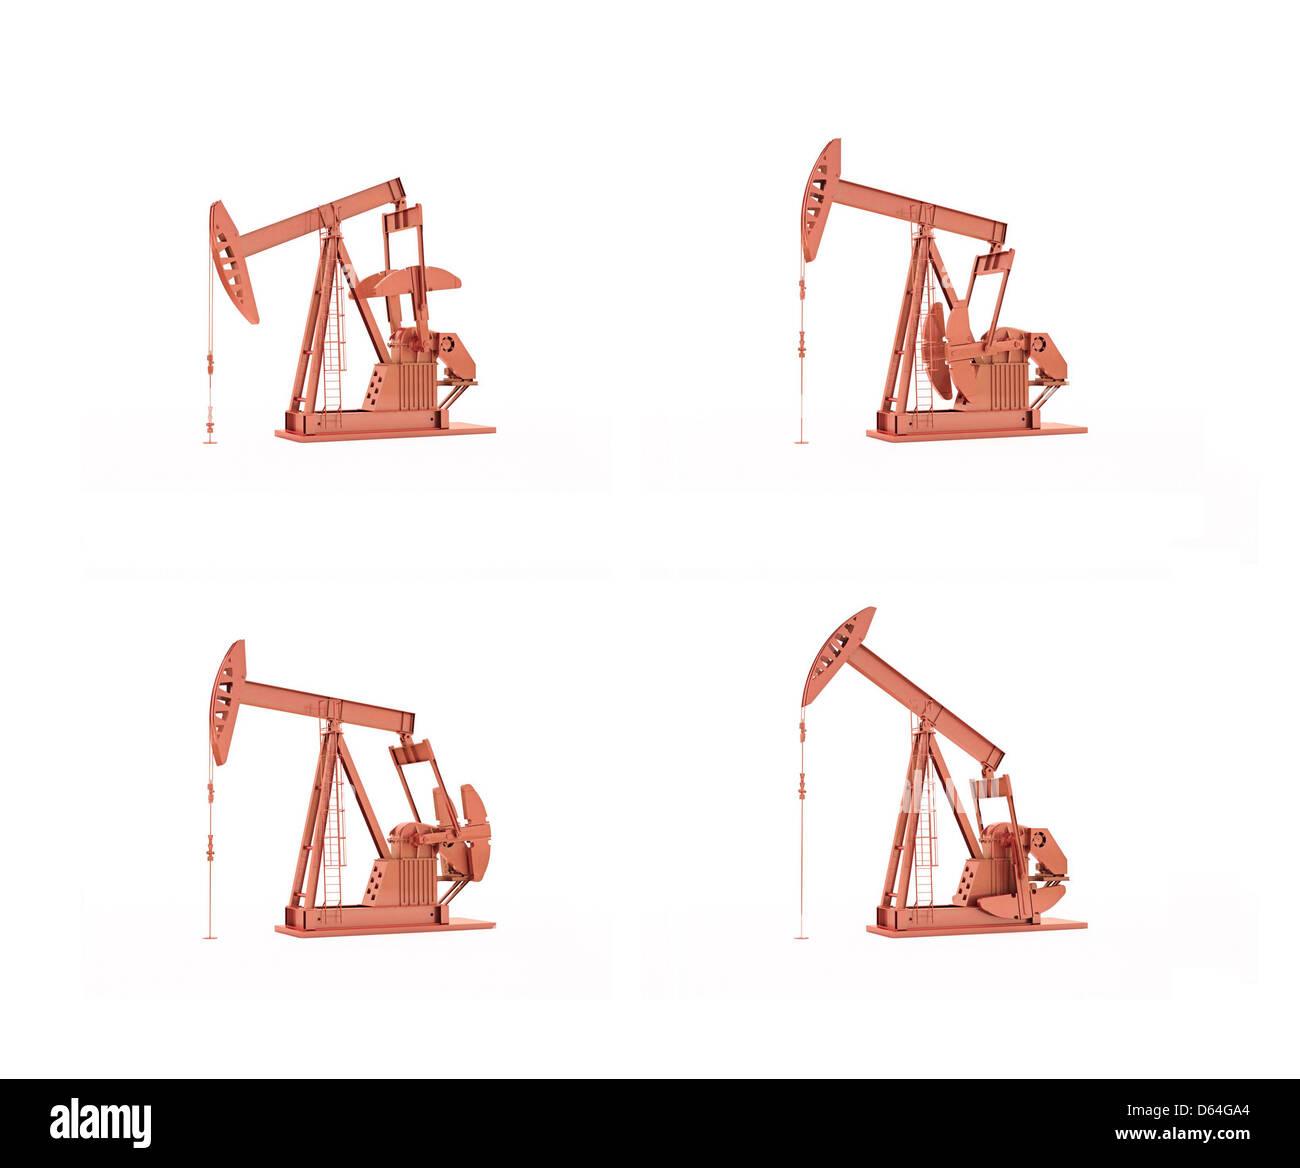 Oil pumps, artwork - Stock Image